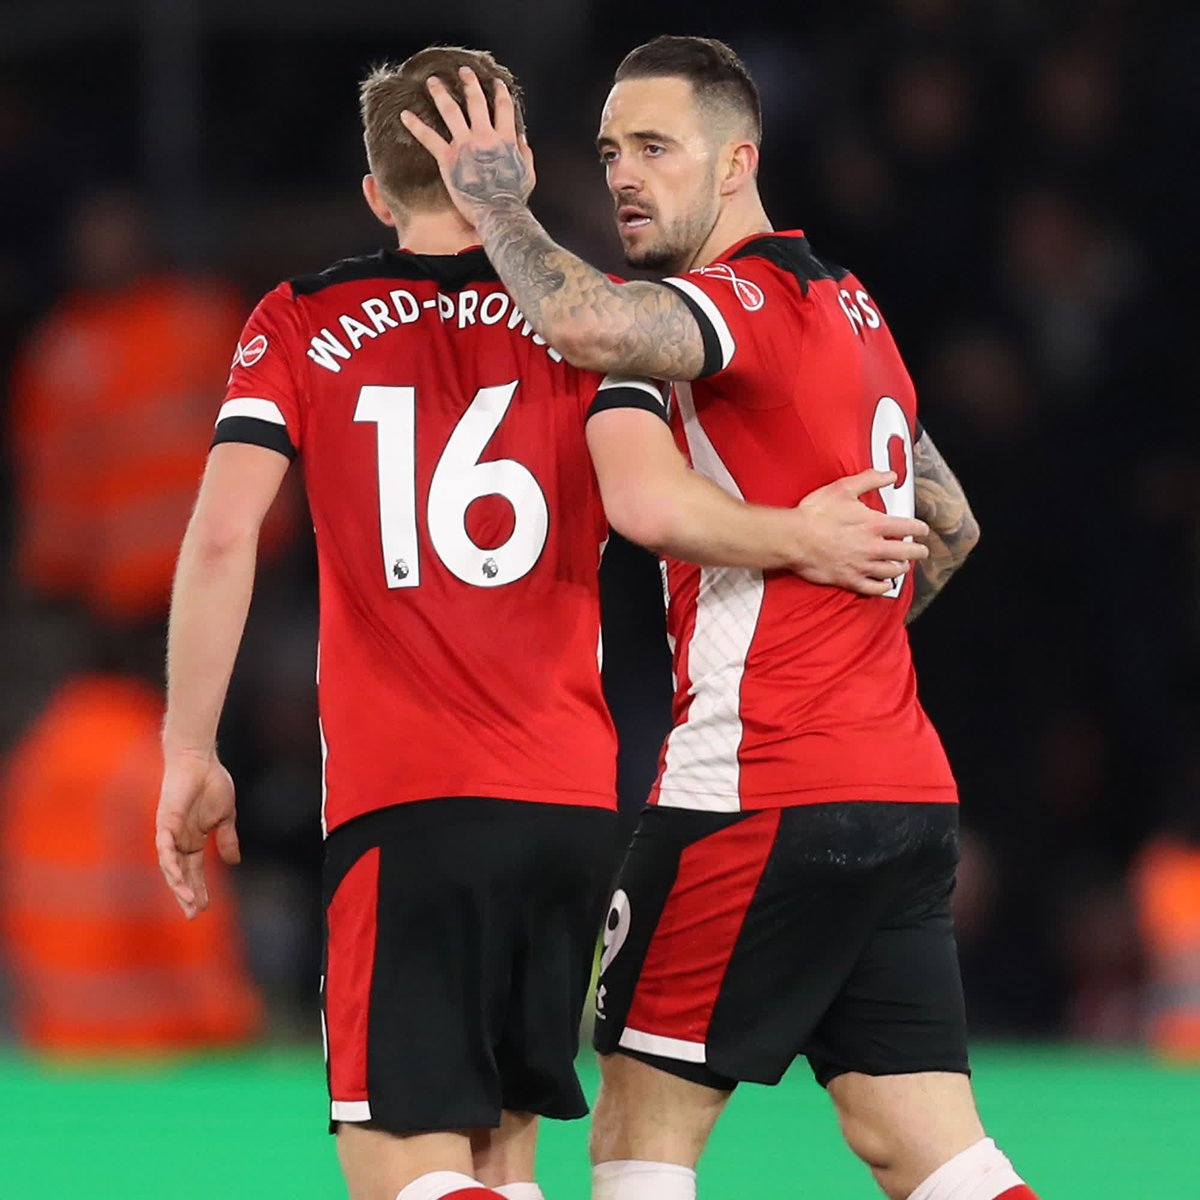 Southampton FC @SouthamptonFC